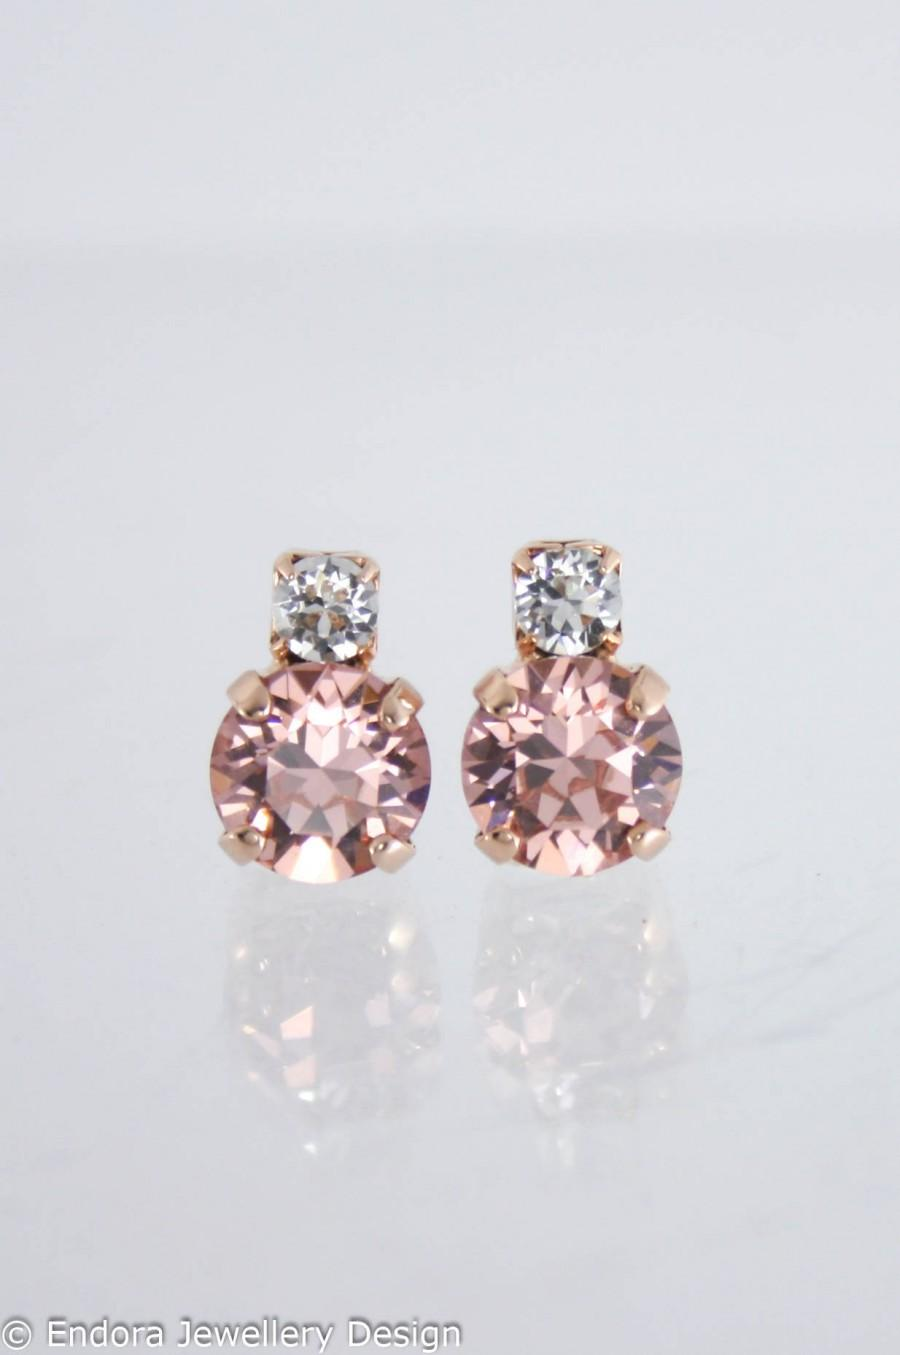 Mariage - Blush earrings,blush bridesmaid earrings,petite blush earrings,Swarovski,Swarovski blush earrings,blush wedding jewelry,blush rose gold,stud